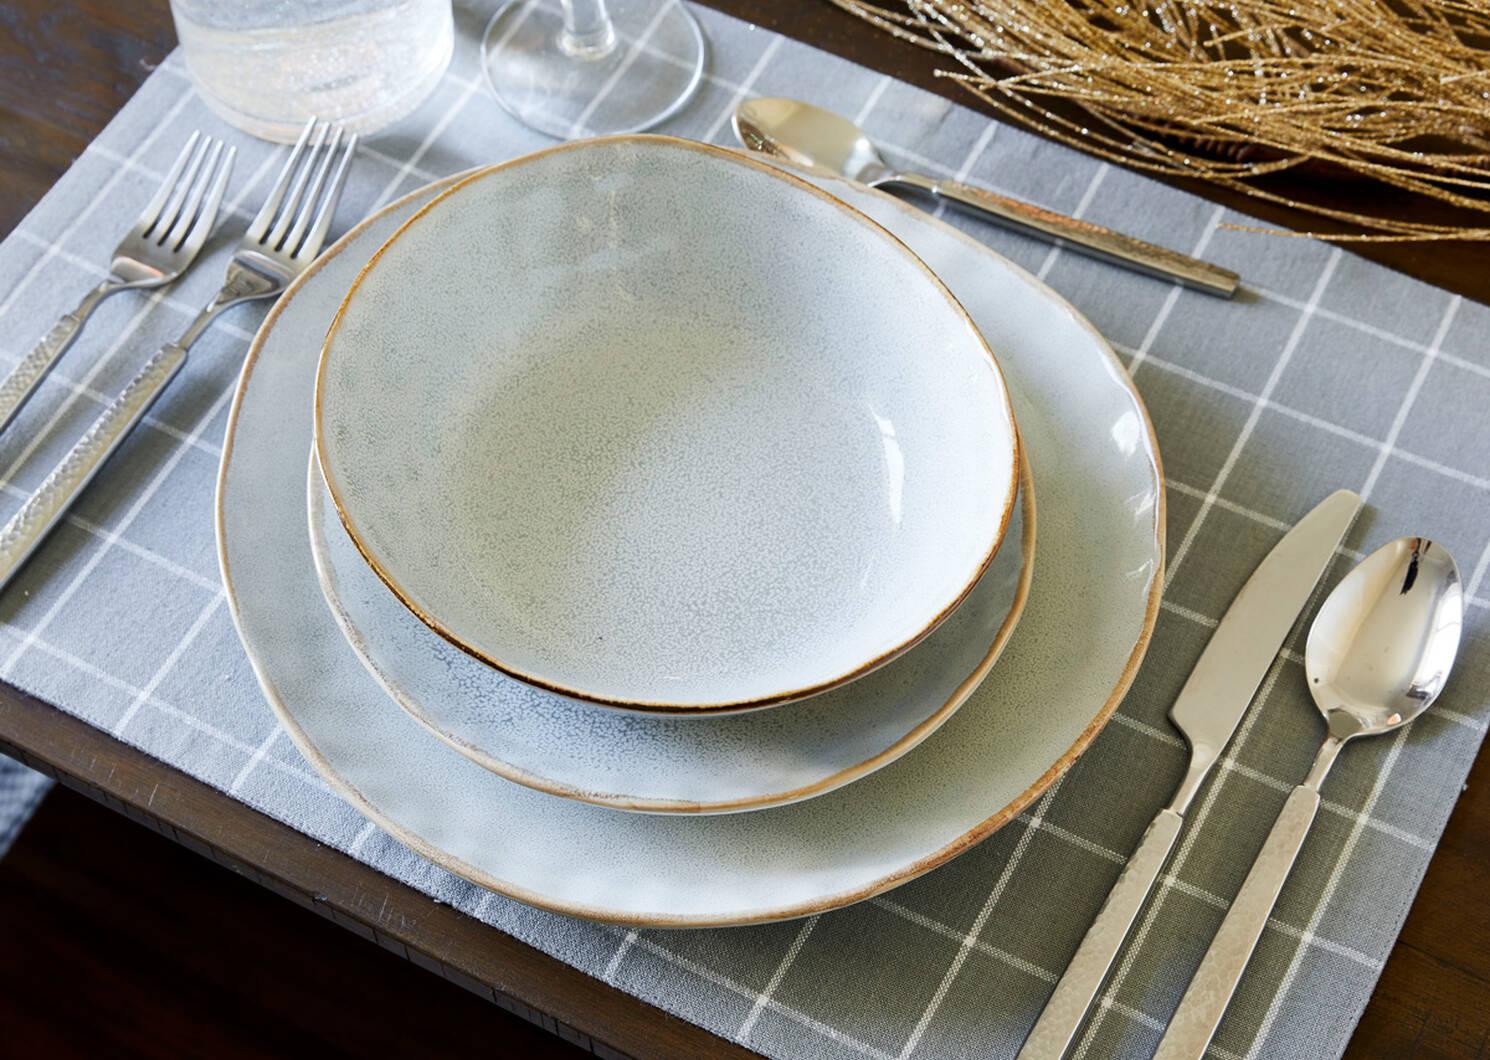 Crofton 16pc Dish Set Light Grey